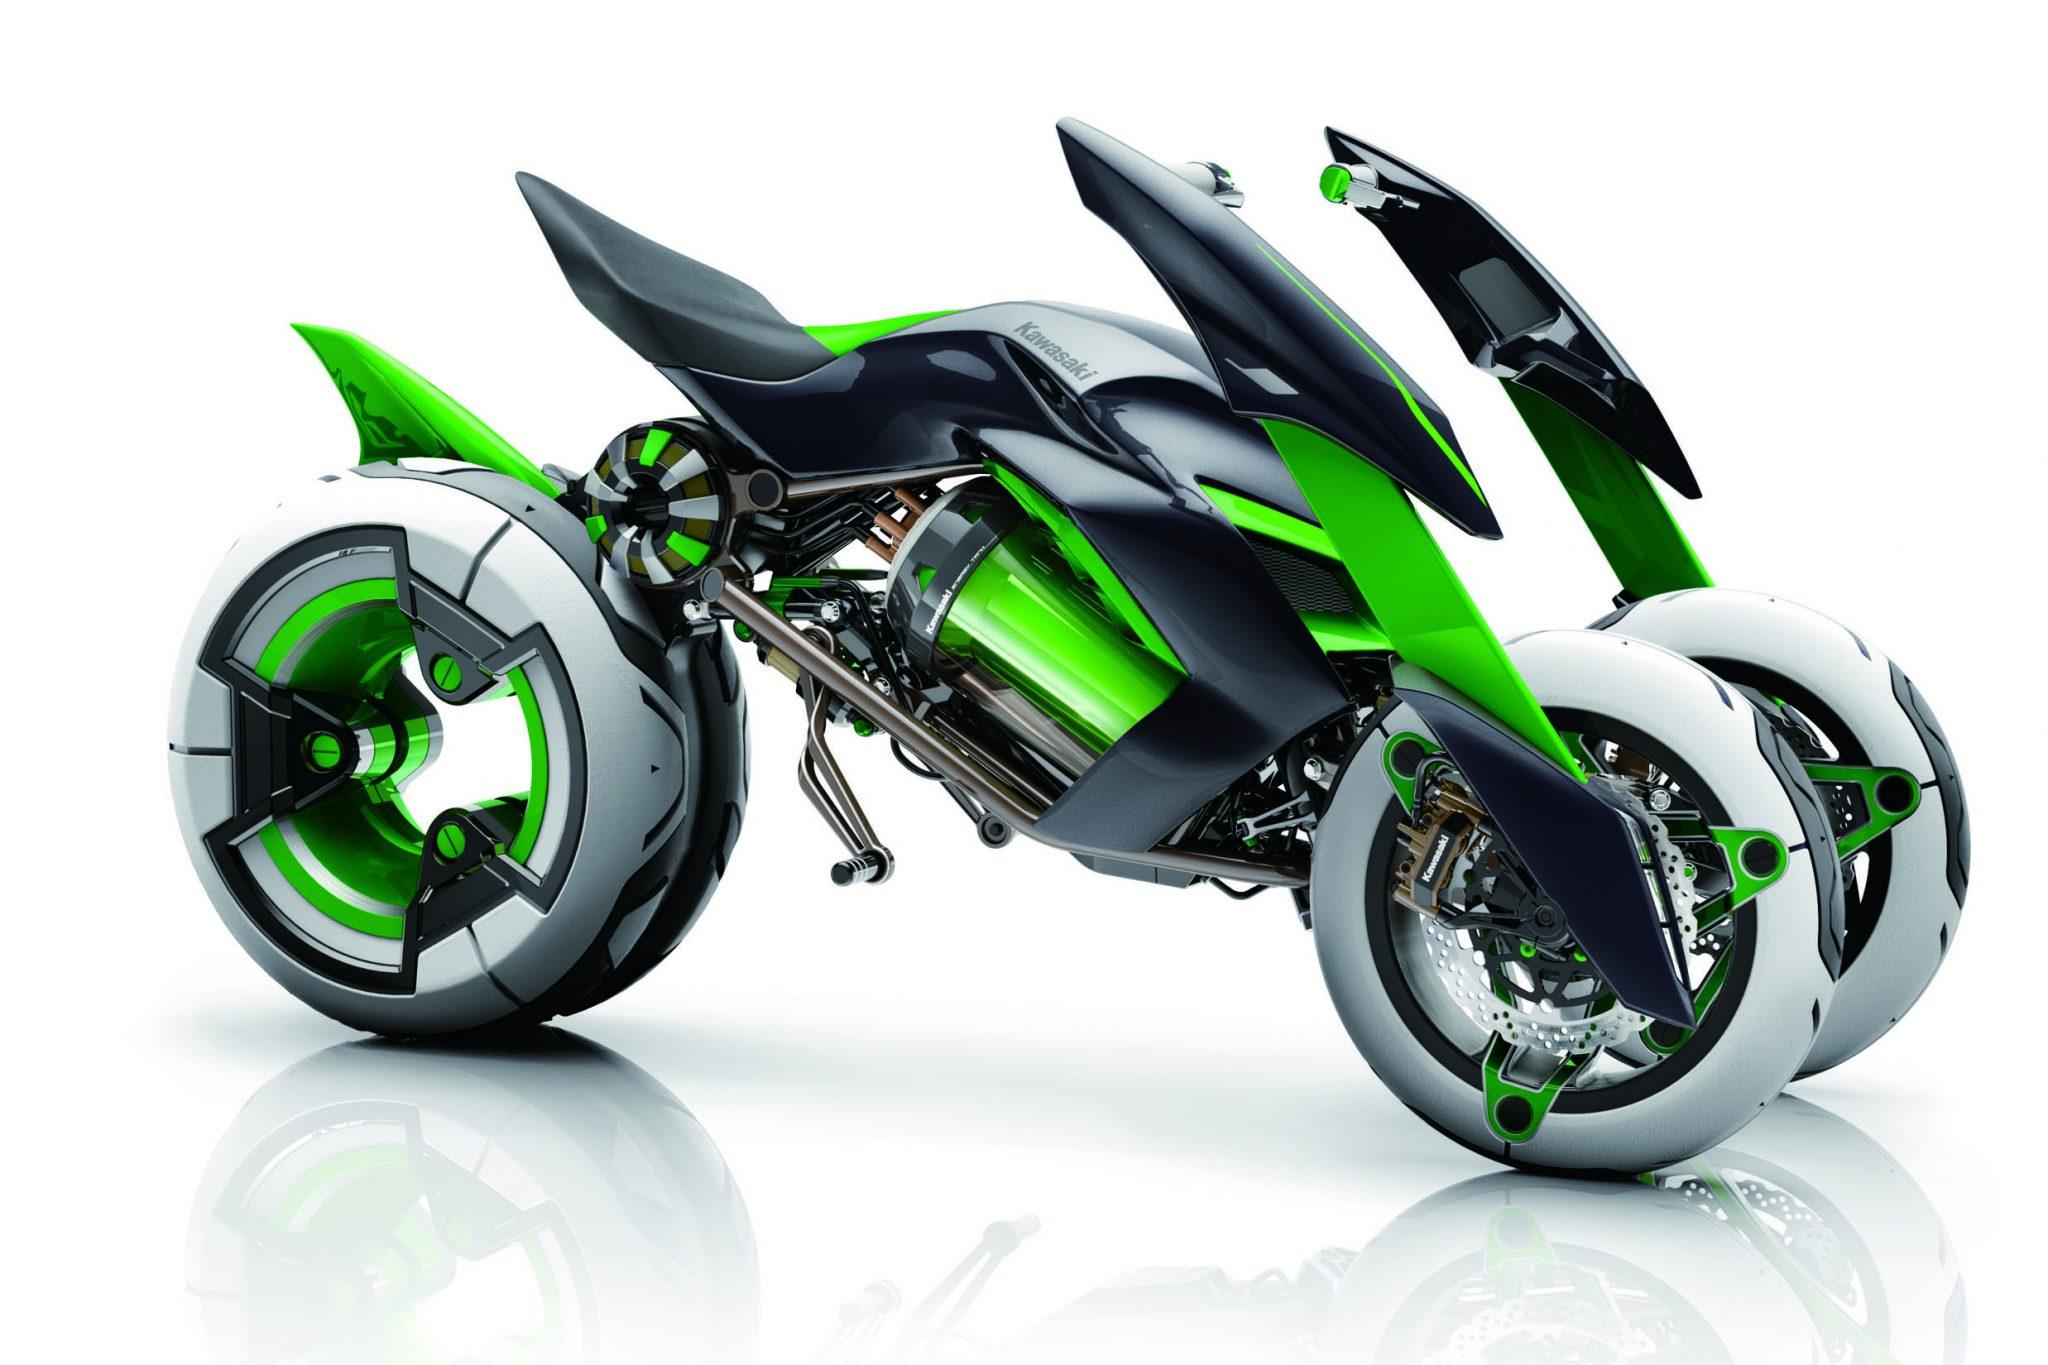 Kawasaki's US arm unveils new promo video for three-wheeler Concept J